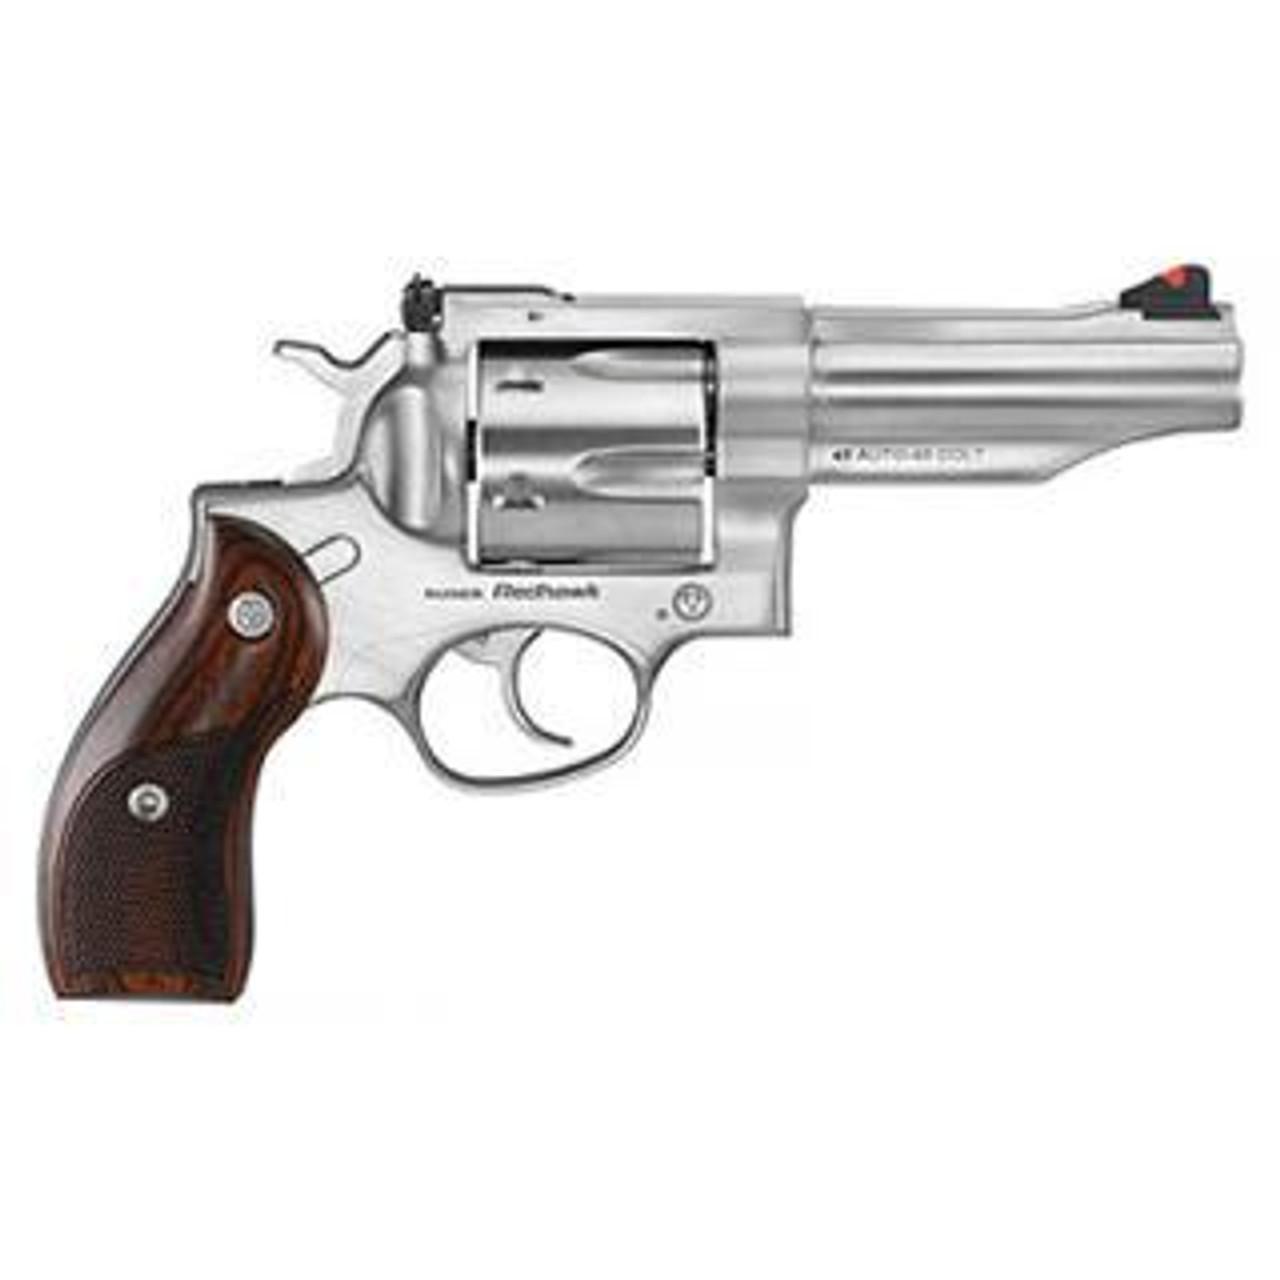 "Ruger Redhawk 4.2"" CALIFORNIA LEGAL -  .45 ACP/.45 Colt"